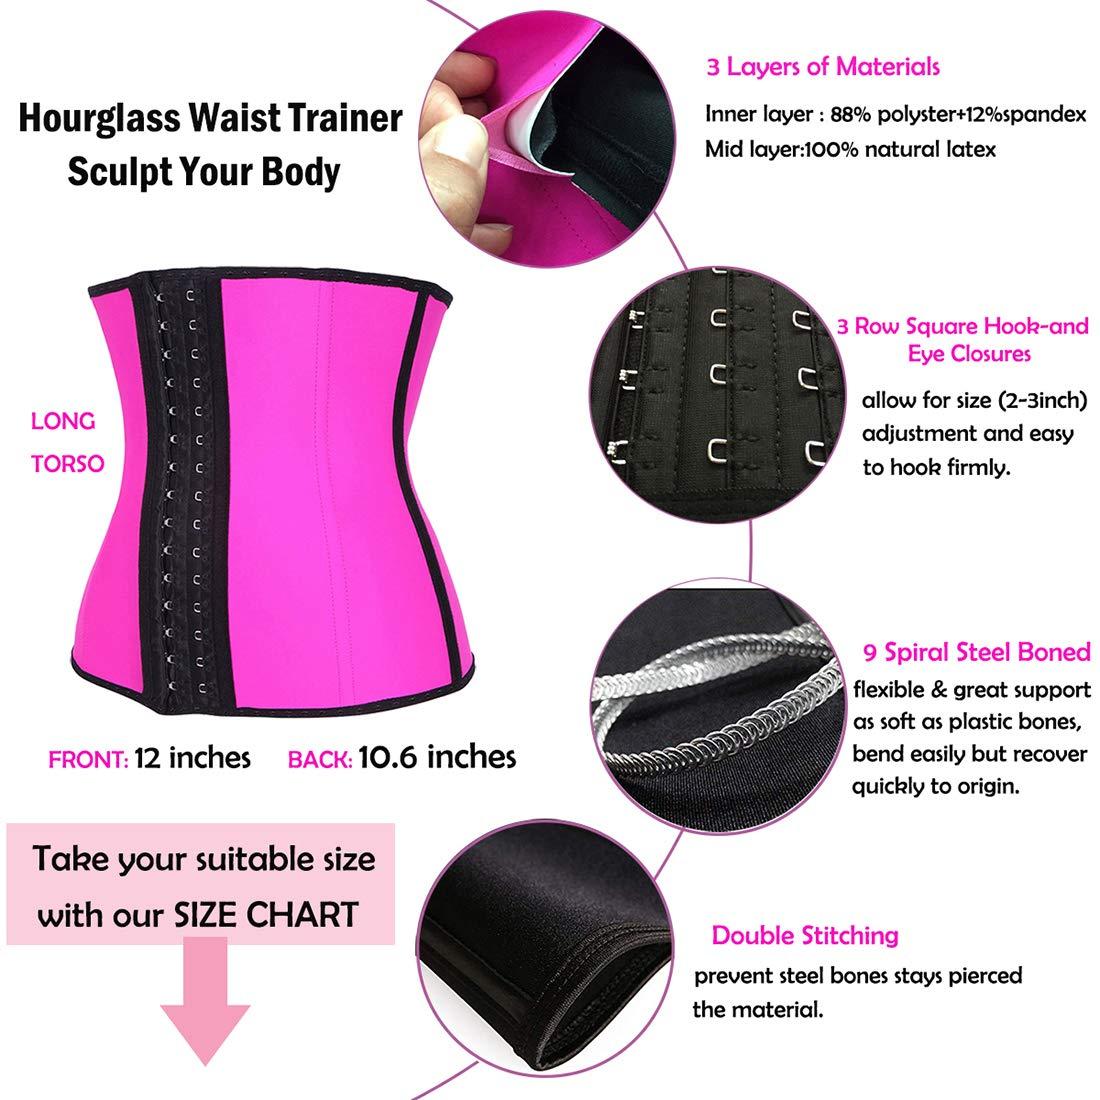 TYUIO Women Waist Trainer Corset for Weight Loss Tummy Control Sport Workout Body Shaper